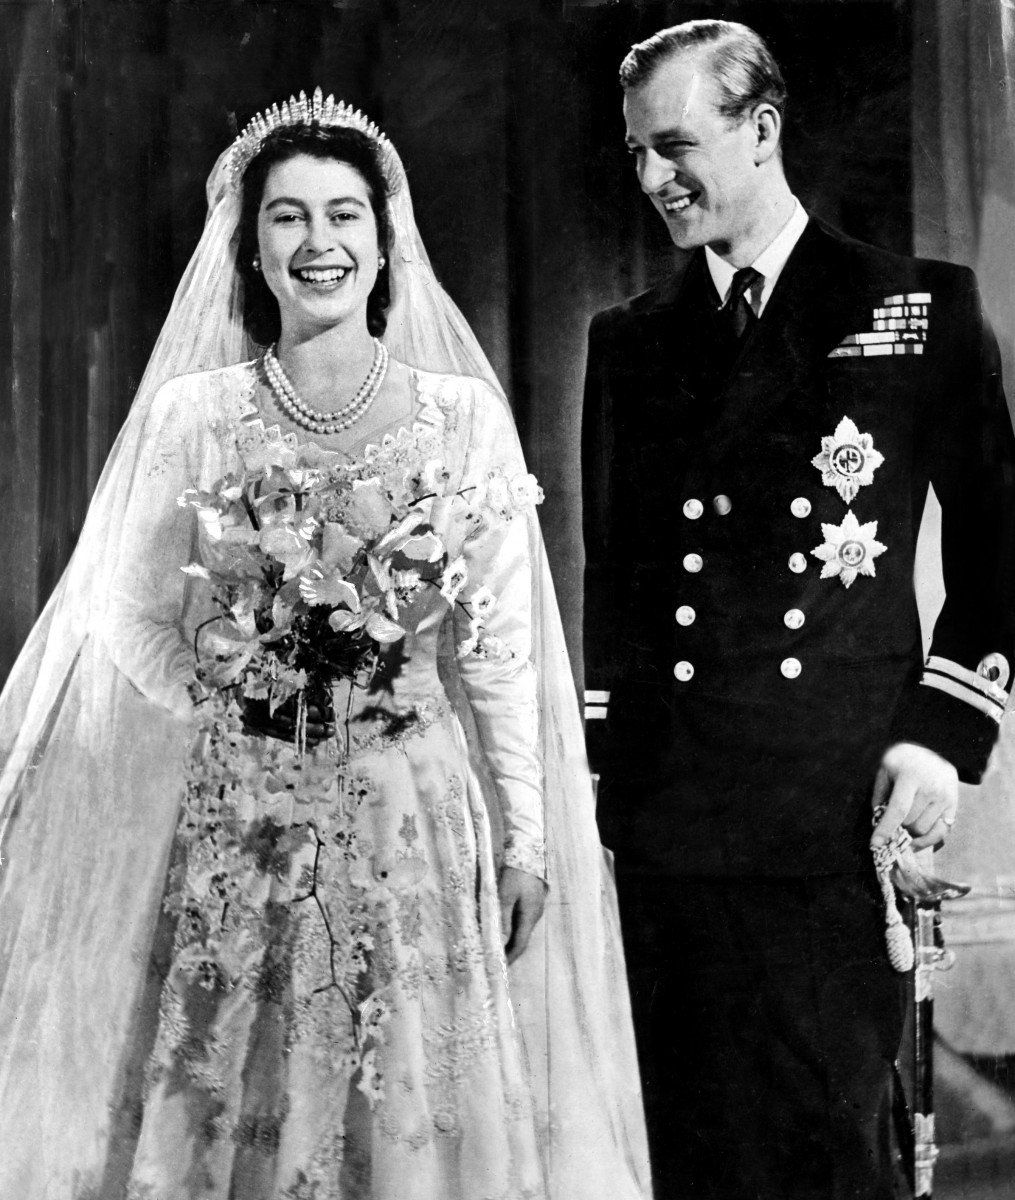 On November 20th 1947, Princess Elizabeth married Philip ...